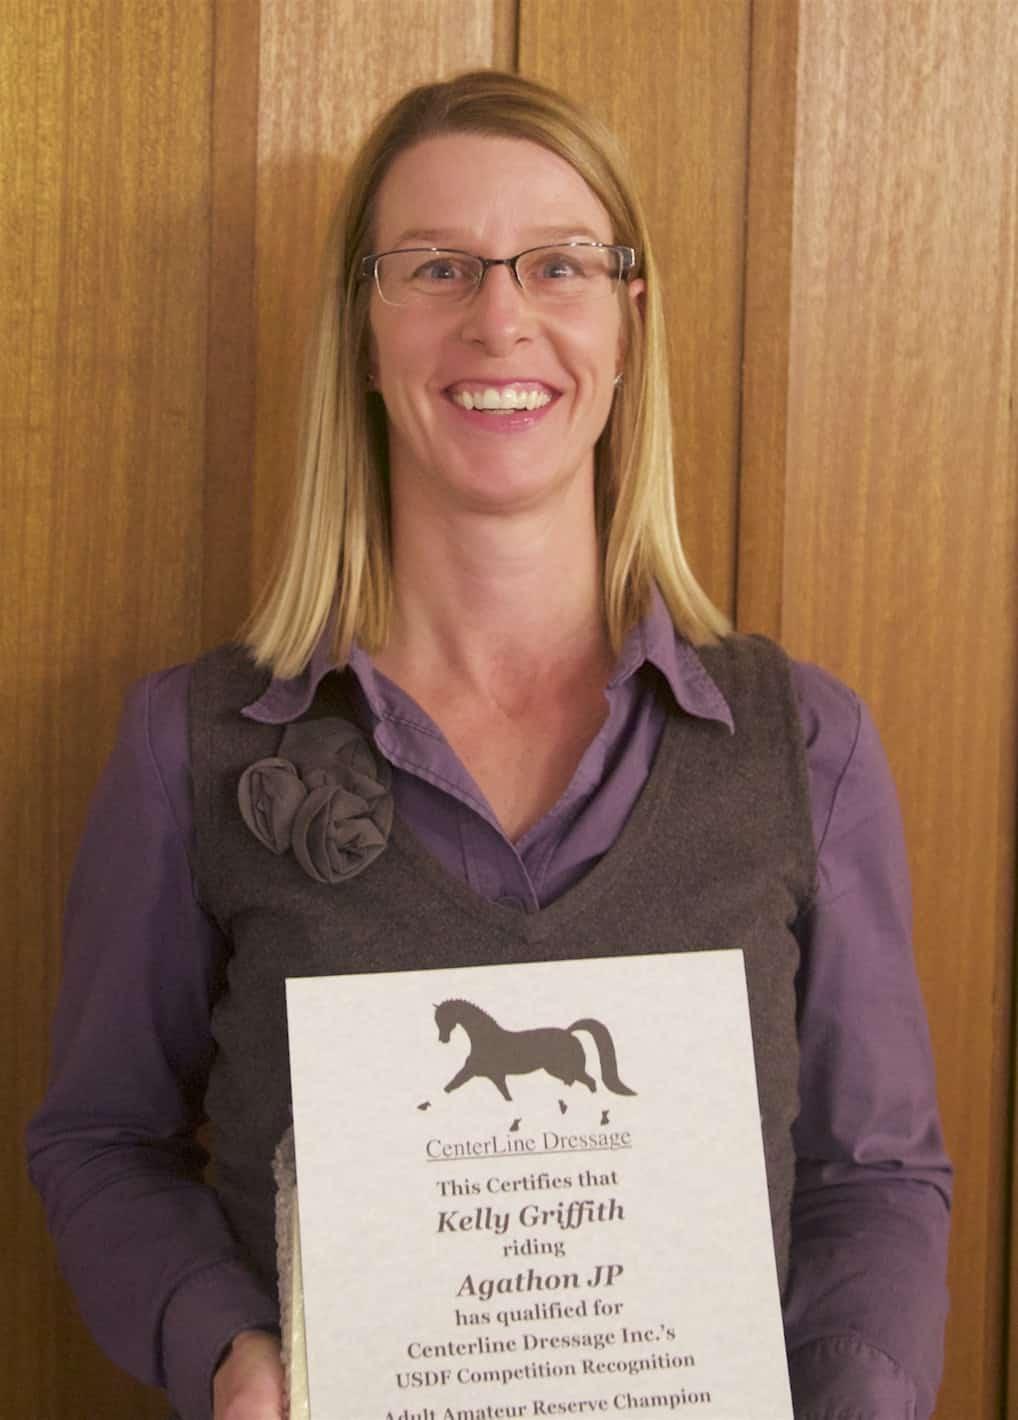 Kelly Griffith accepts an award